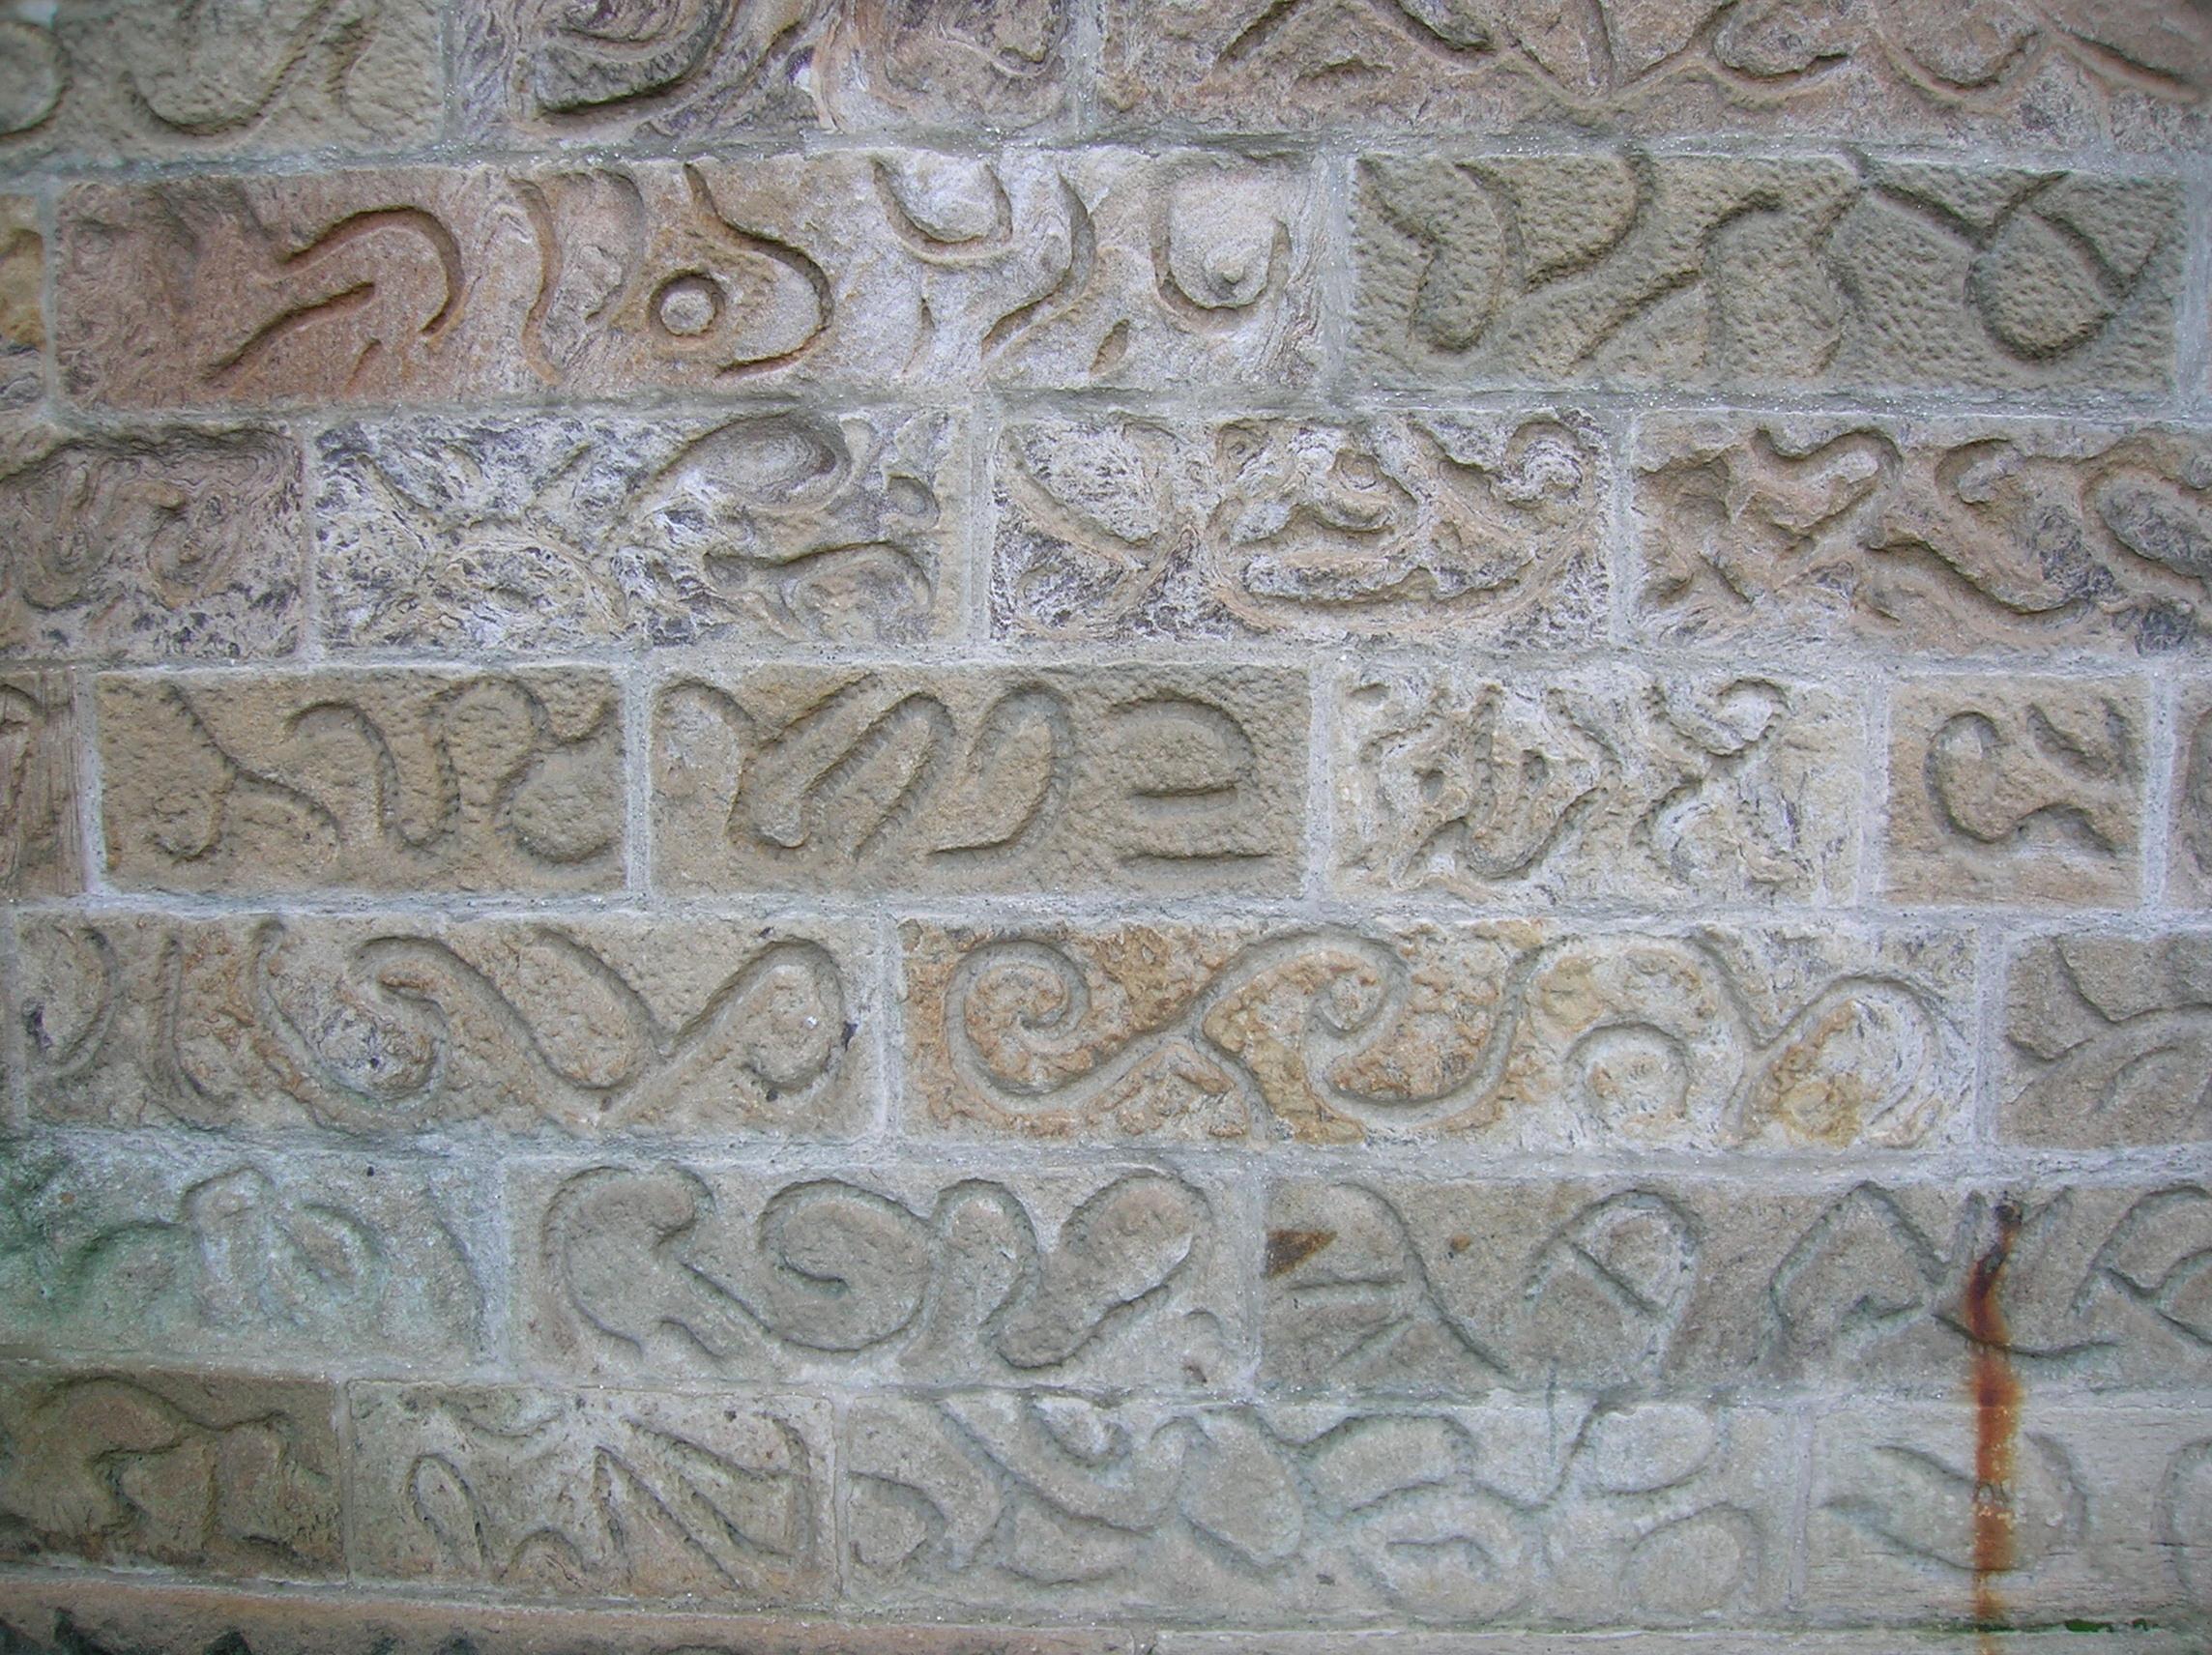 Stone carving techniques images